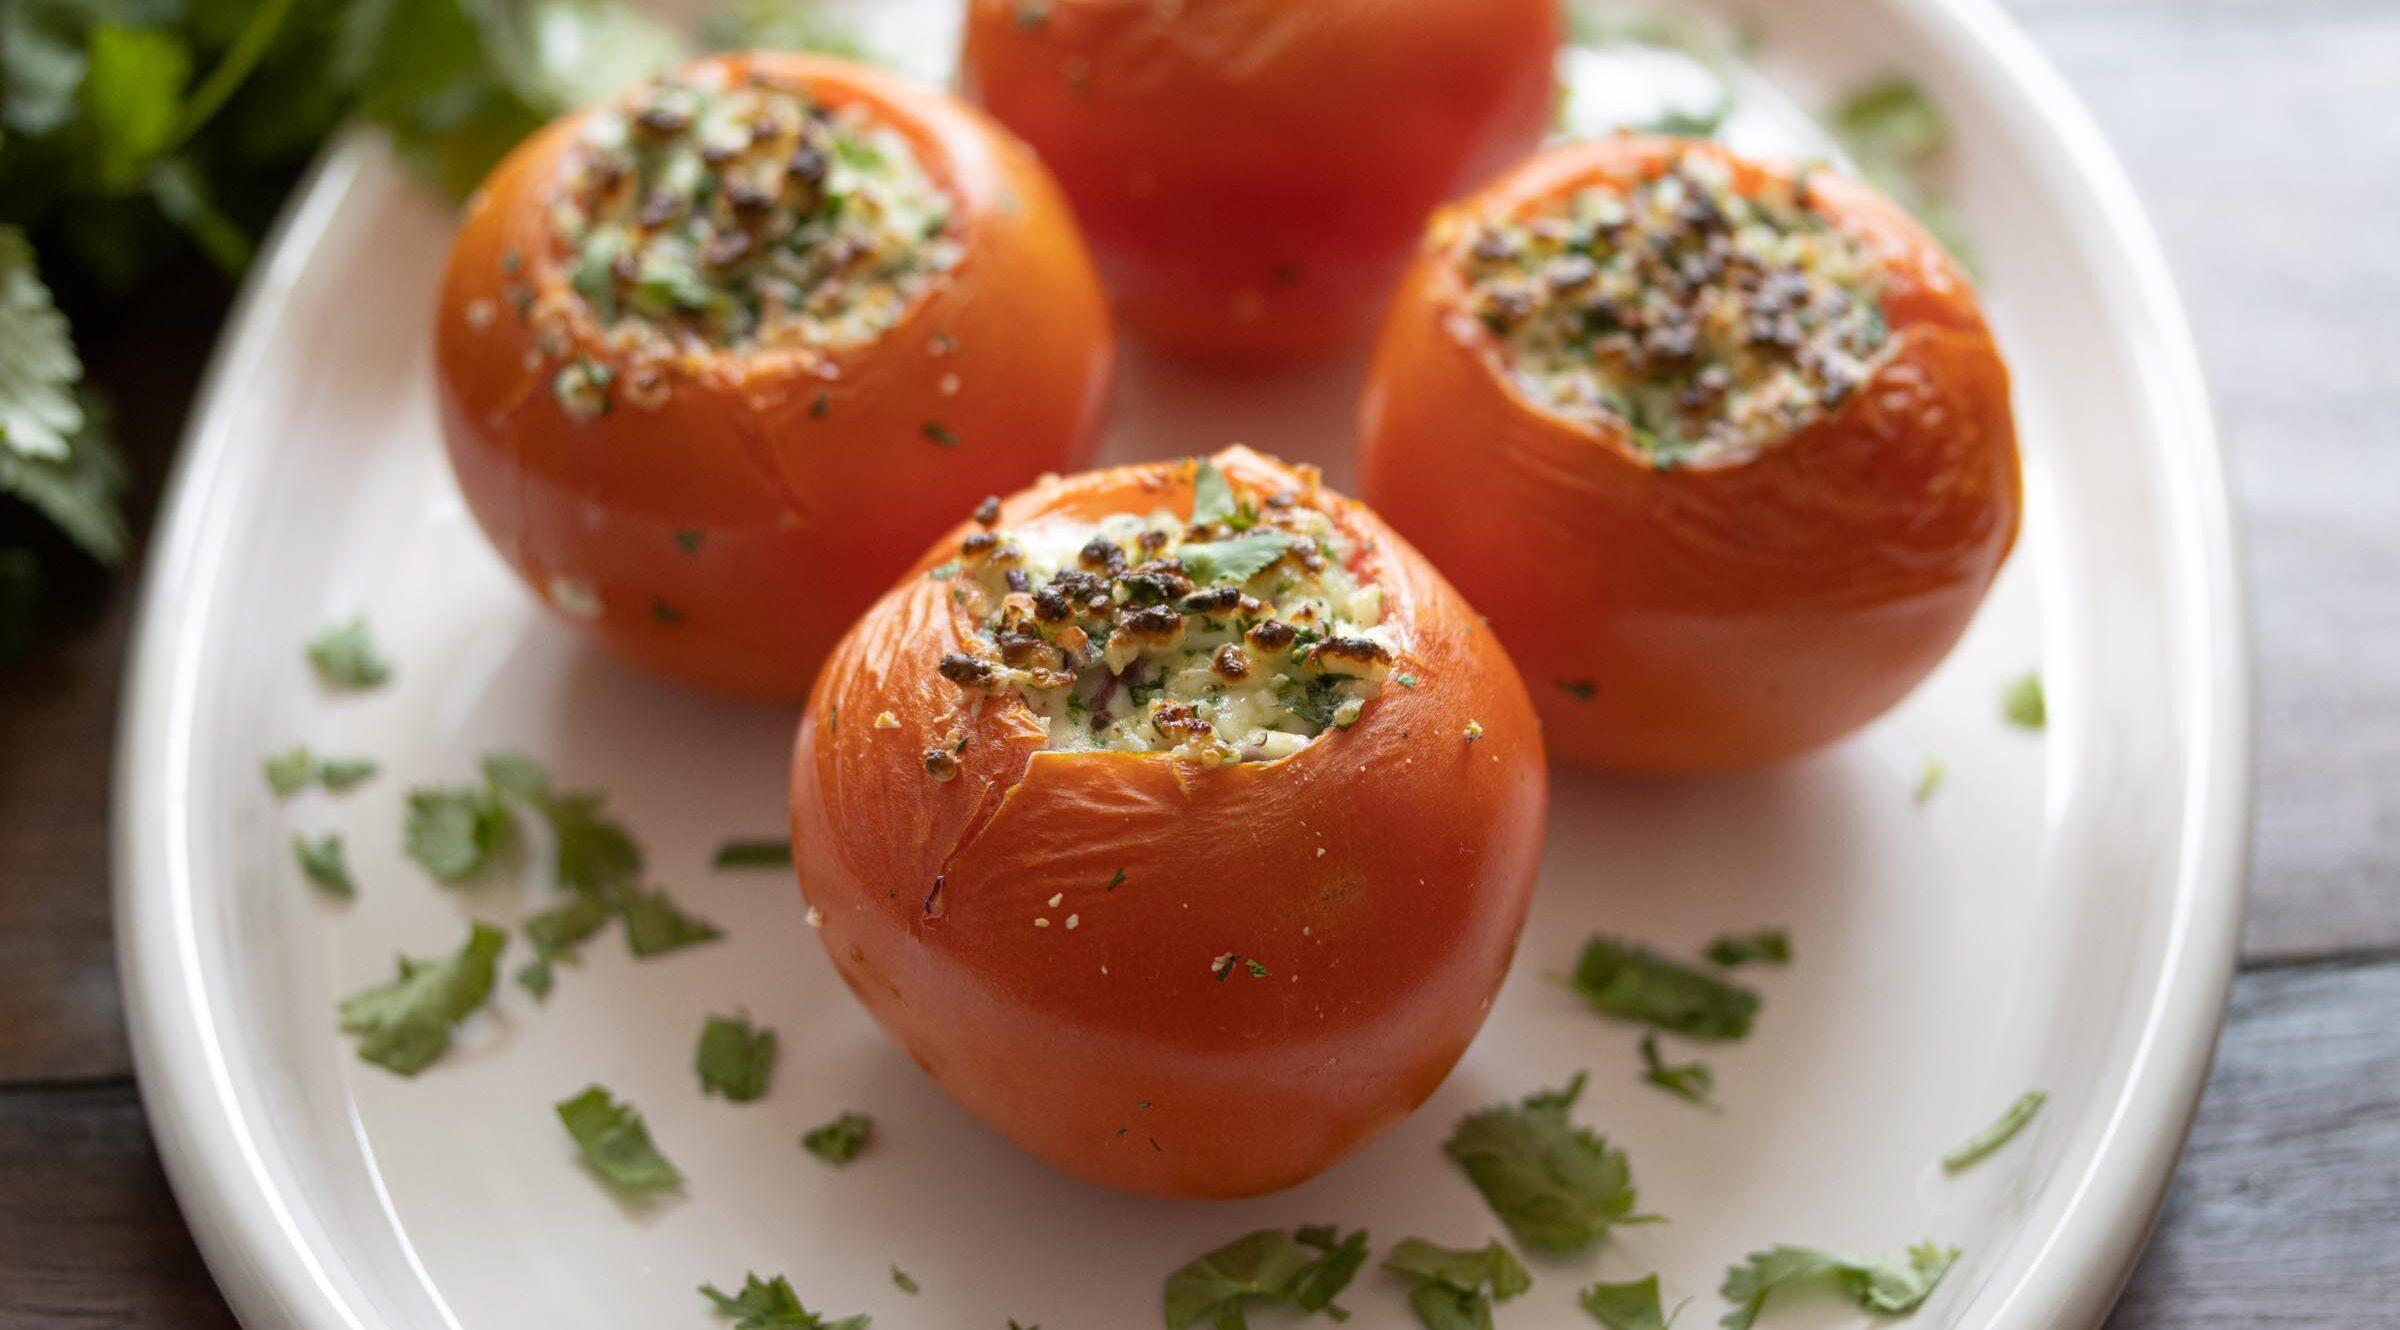 Queso Fresco stuffed tomatoes